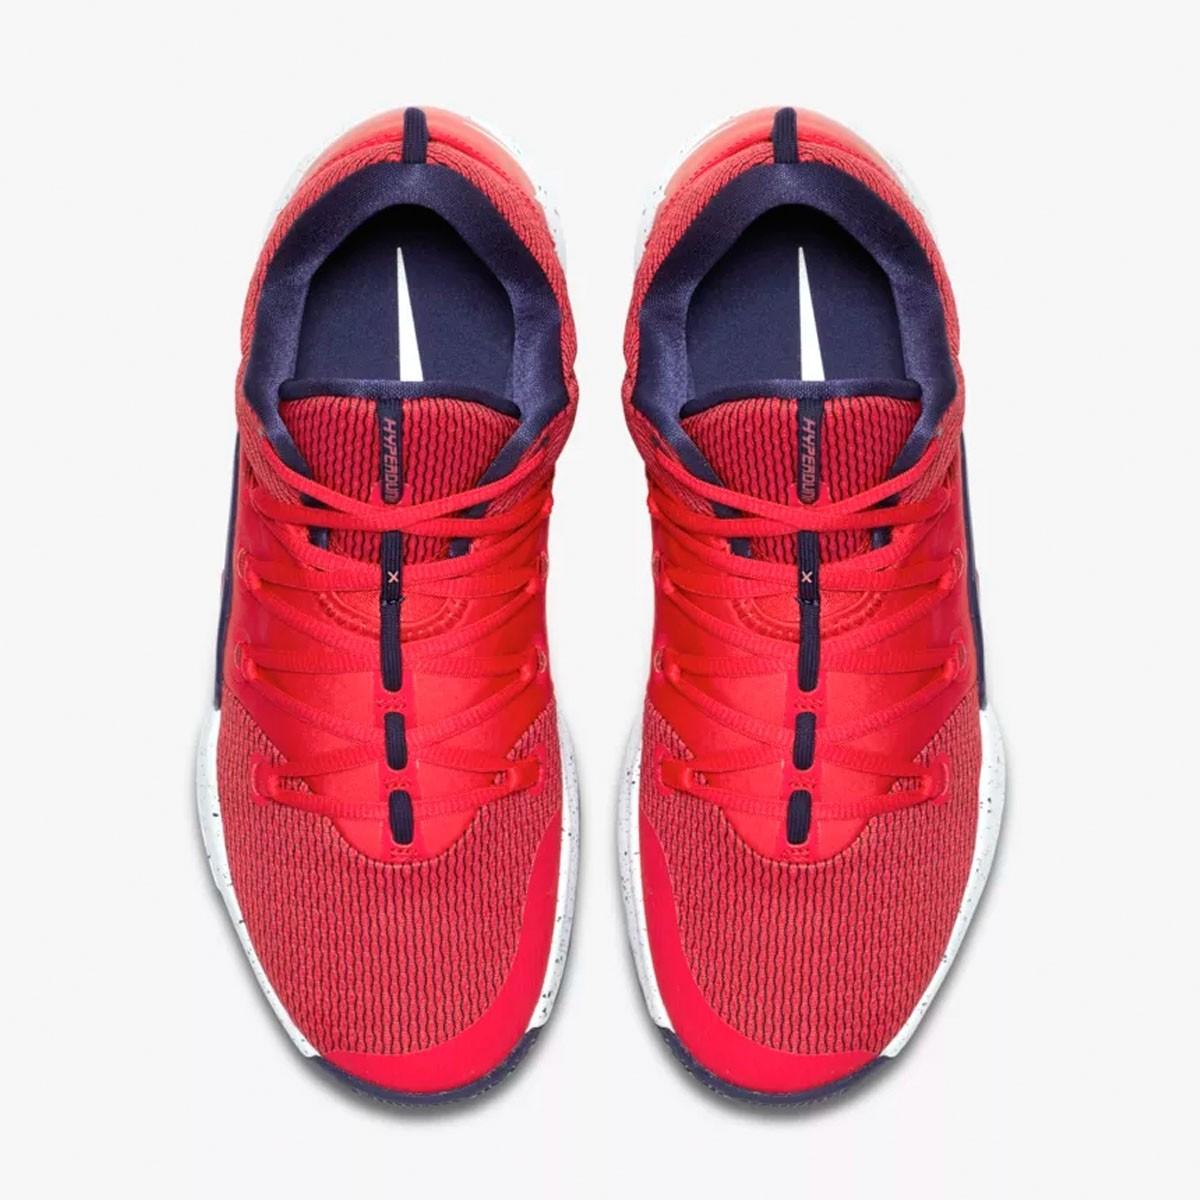 Nike Hyperdunk X Low 2018 'Red Navy' AR0464-600